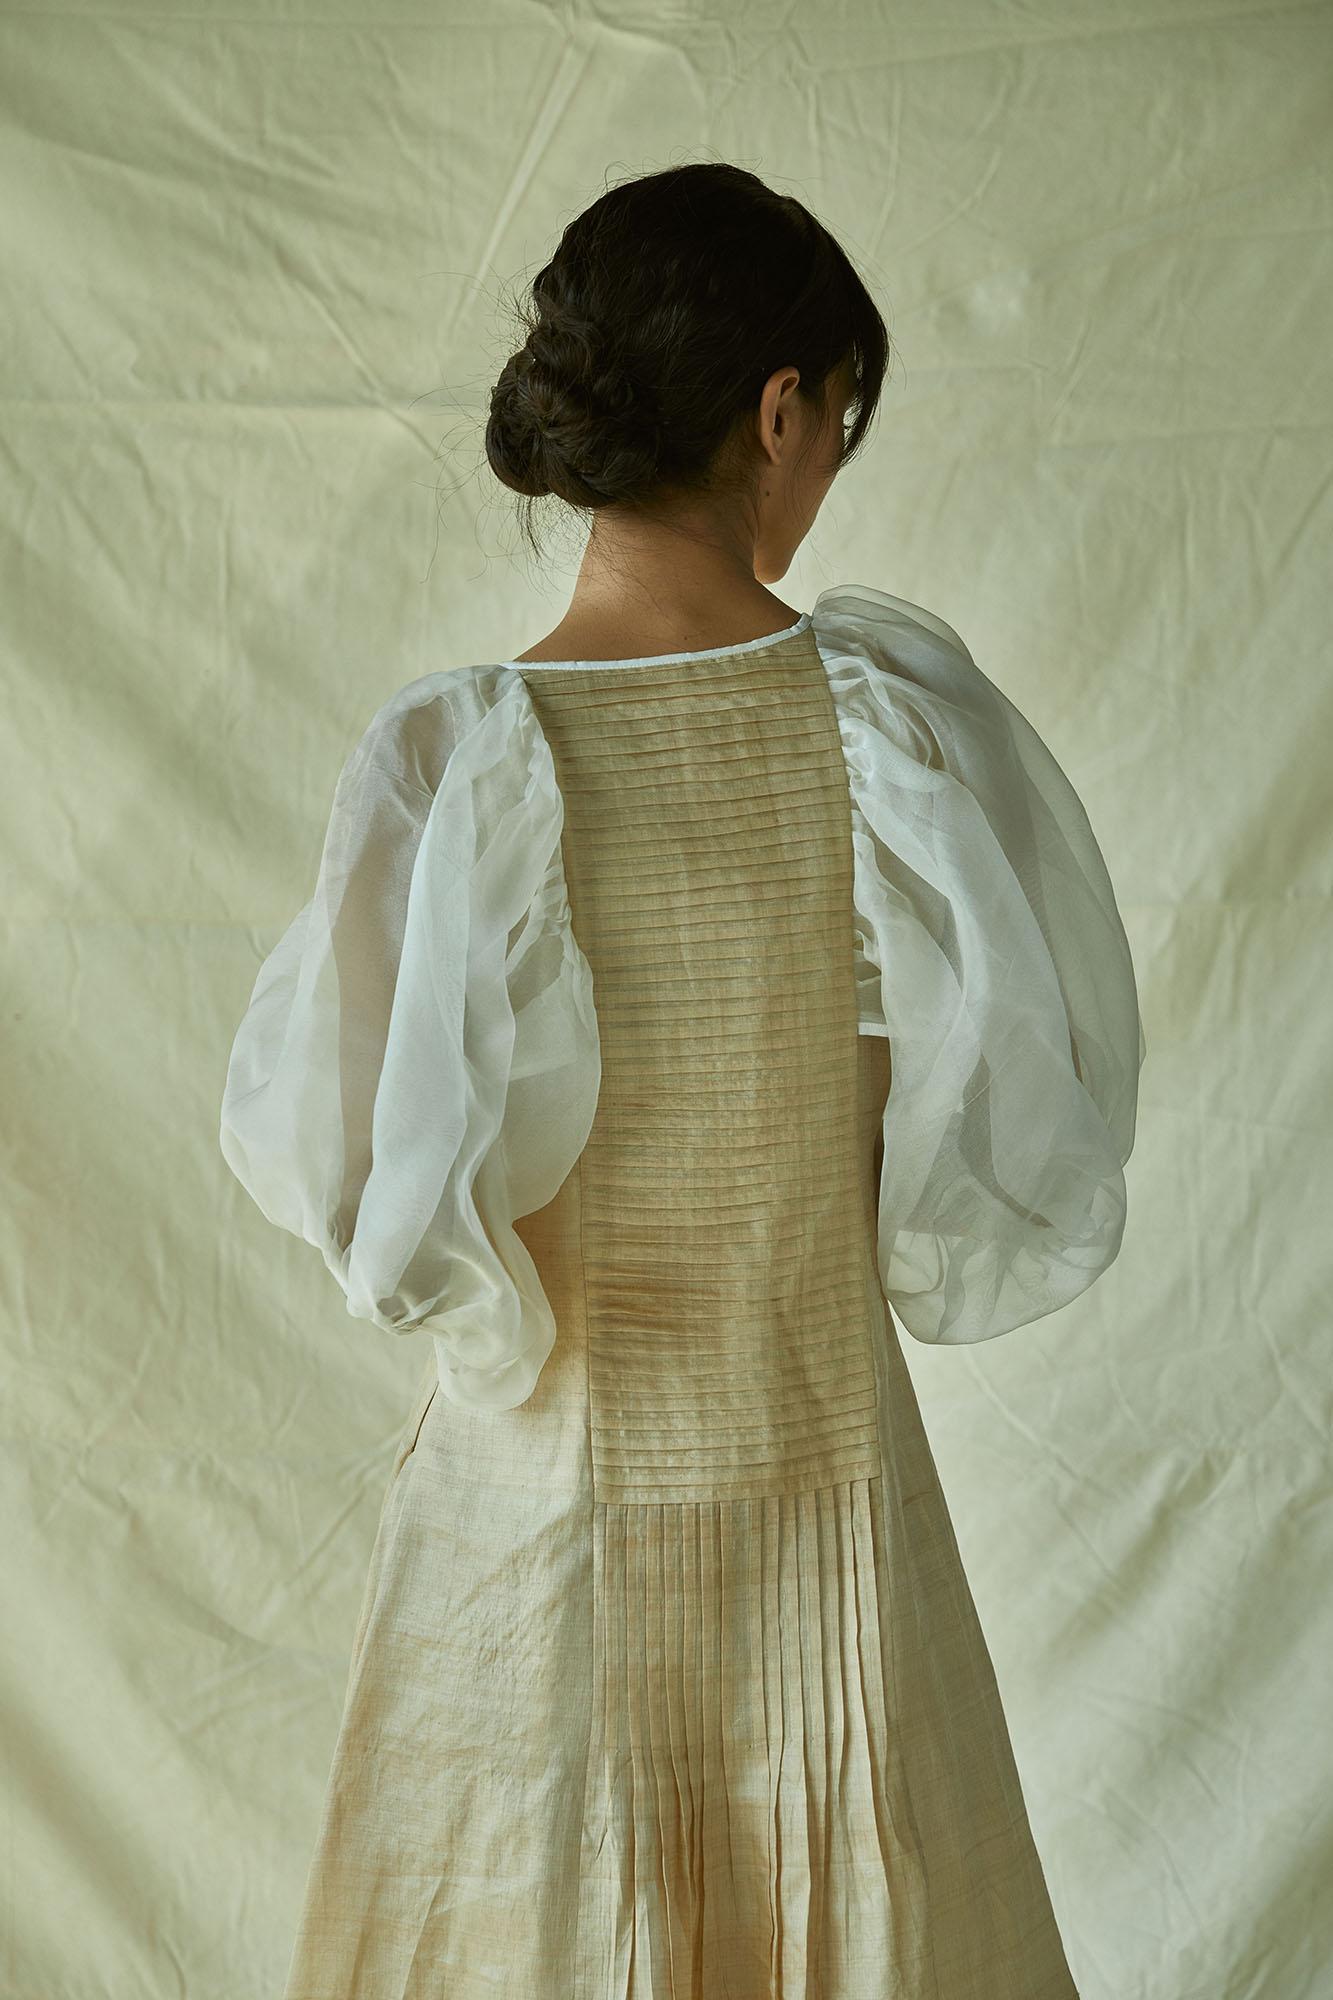 BALLOONED SLEEVED TASSAR MAXI DRESS